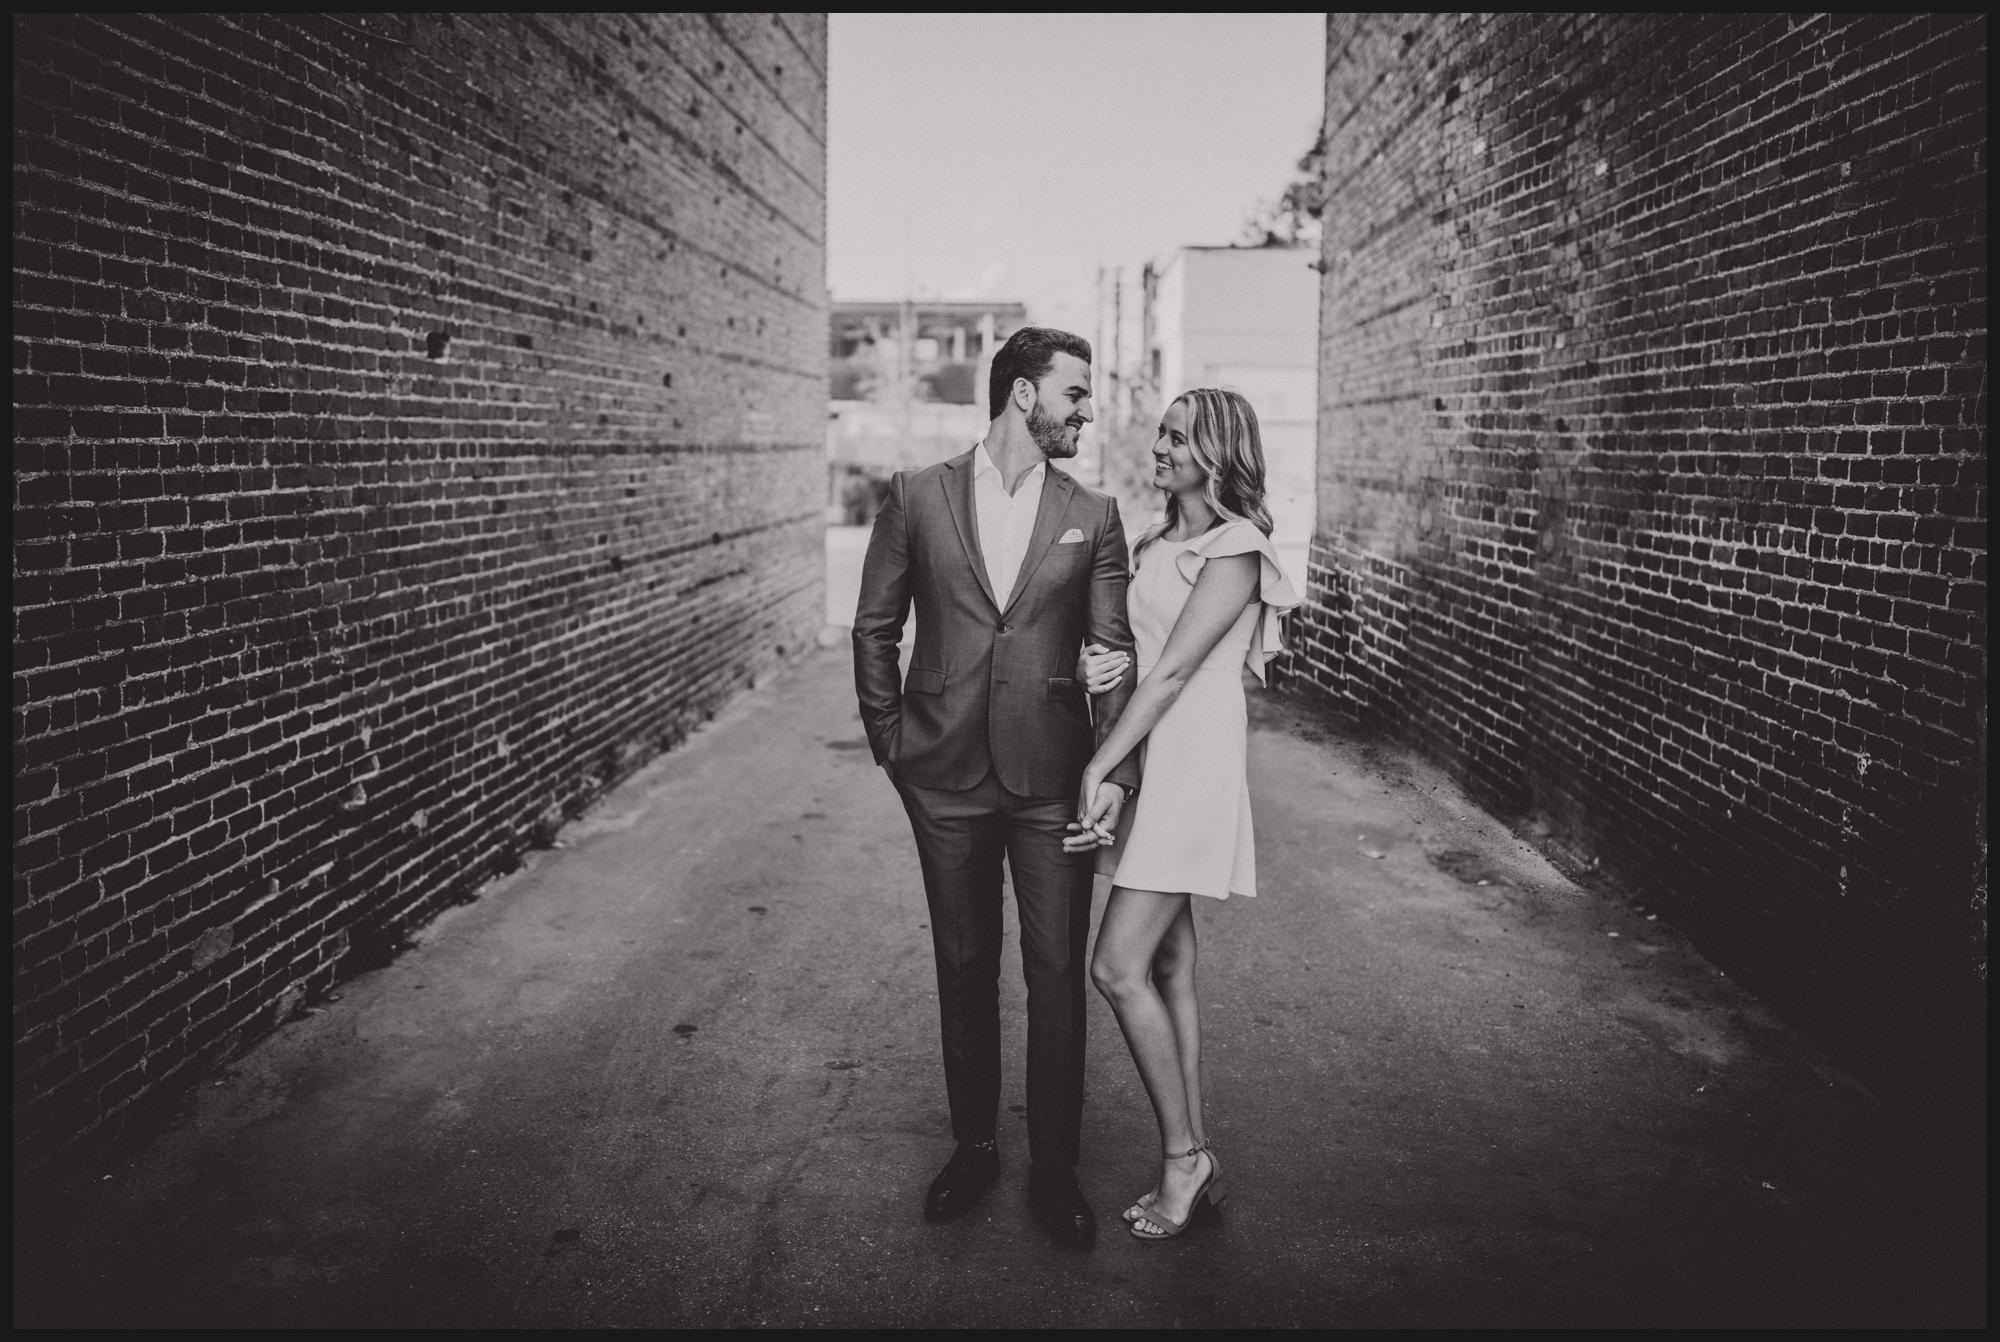 Orlando-Wedding-Photographer-destination-wedding-photographer-florida-wedding-photographer-bohemian-wedding-photographer_1670.jpg